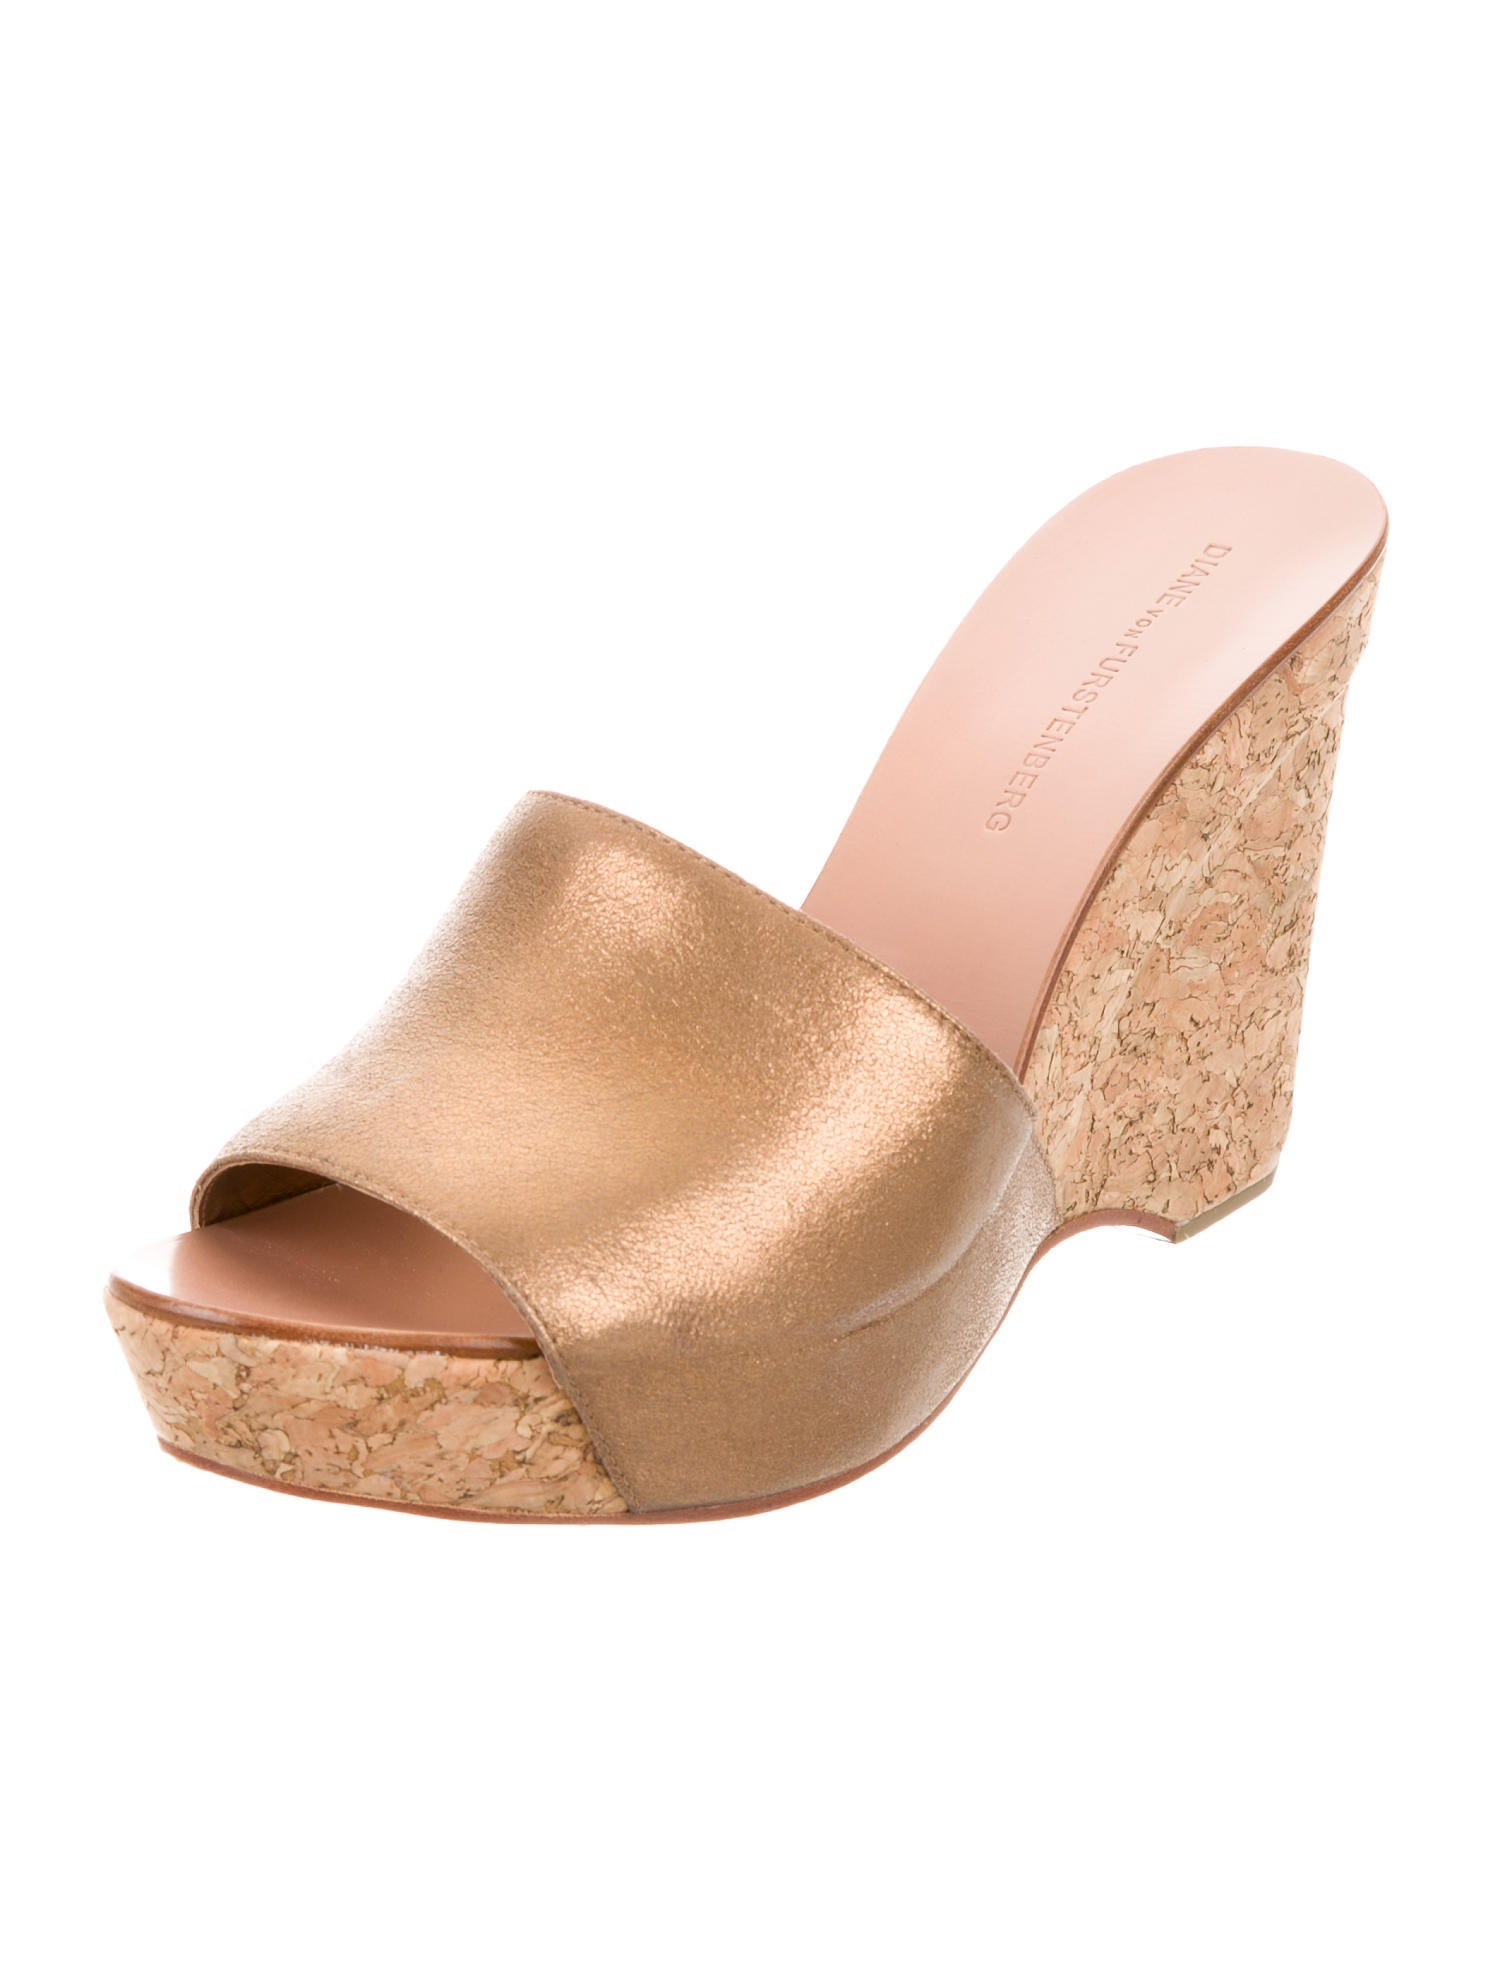 diane furstenberg metallic cork slide wedges shoes